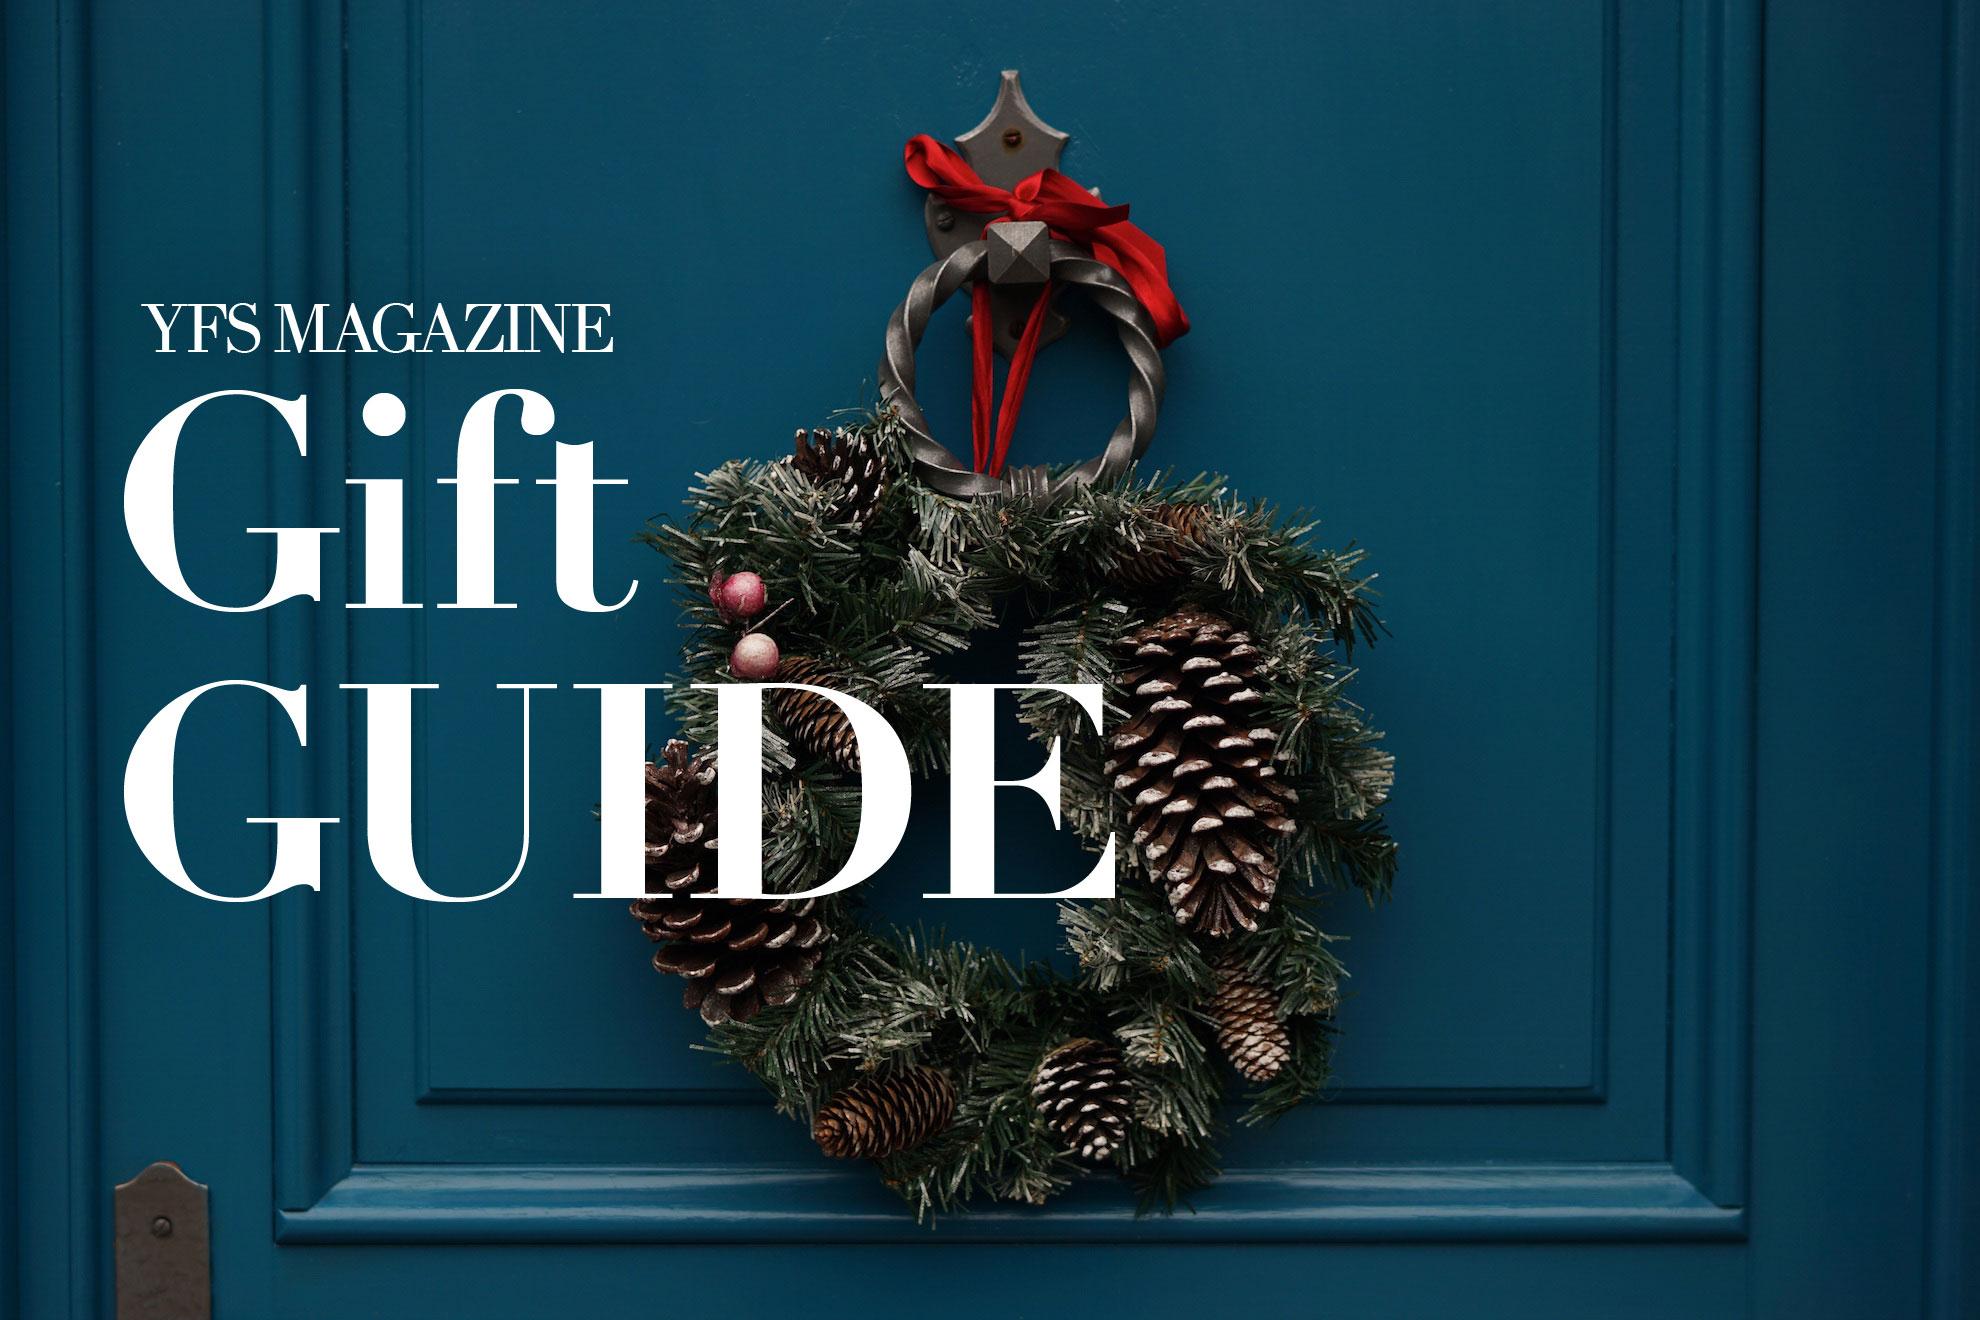 yfs-magazine-gift-guide